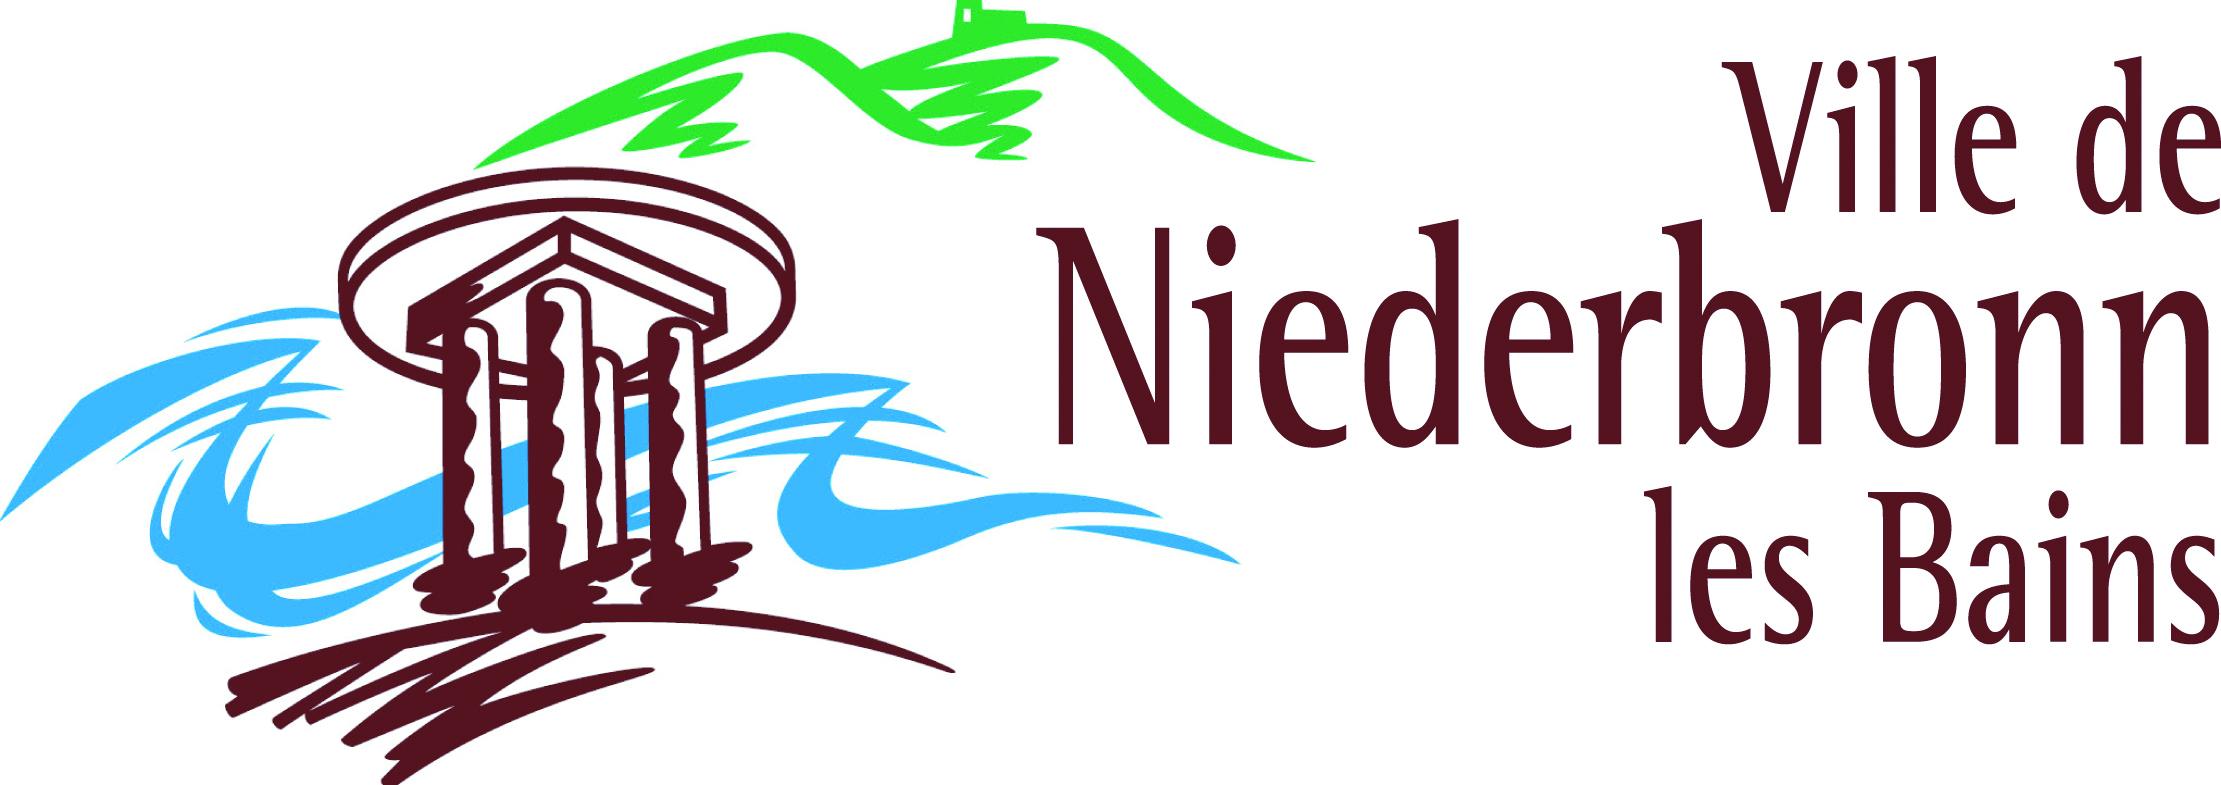 Logos en téléchargement